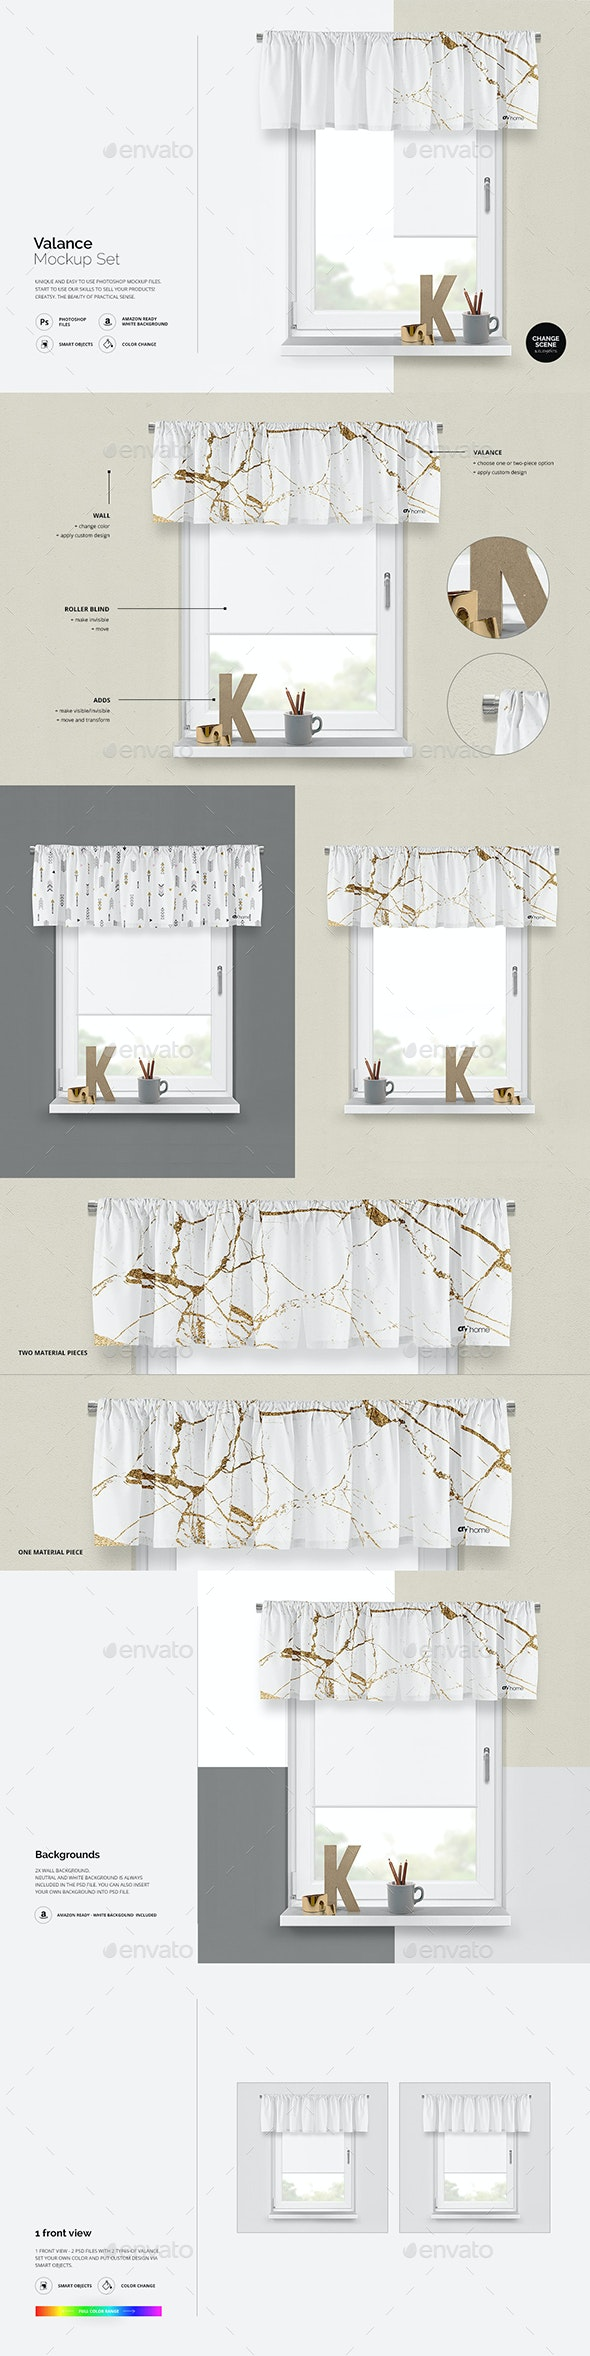 Curtain Valance Mockup - Product Mock-Ups Graphics